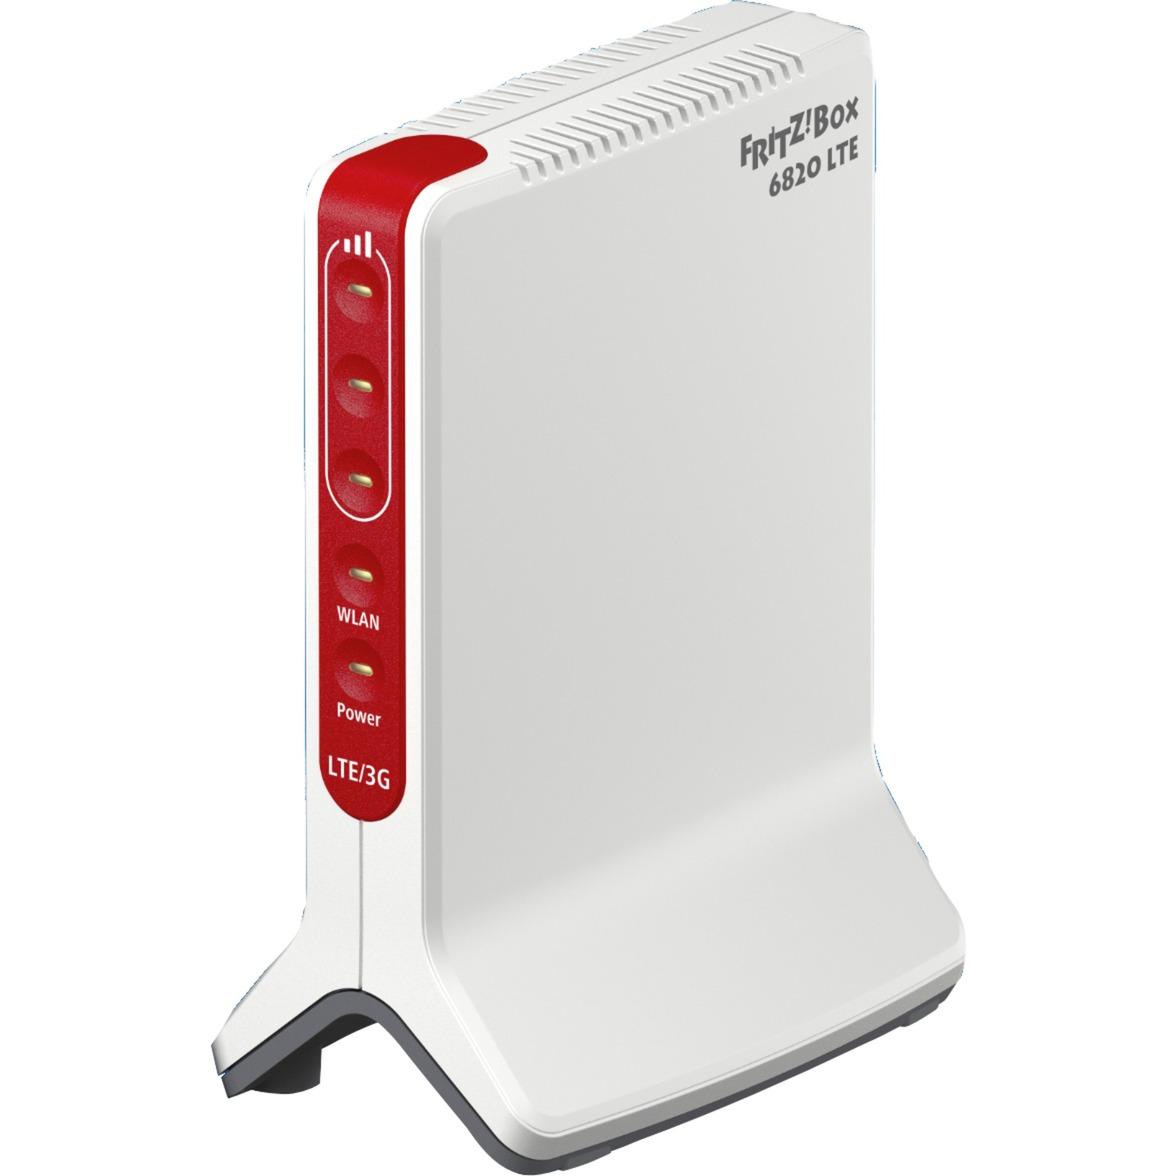 FRITZ!Box 6820 LTE Monobande (2,4 GHz) Gigabit Ethernet 3G 4G Blanc routeur sans fil